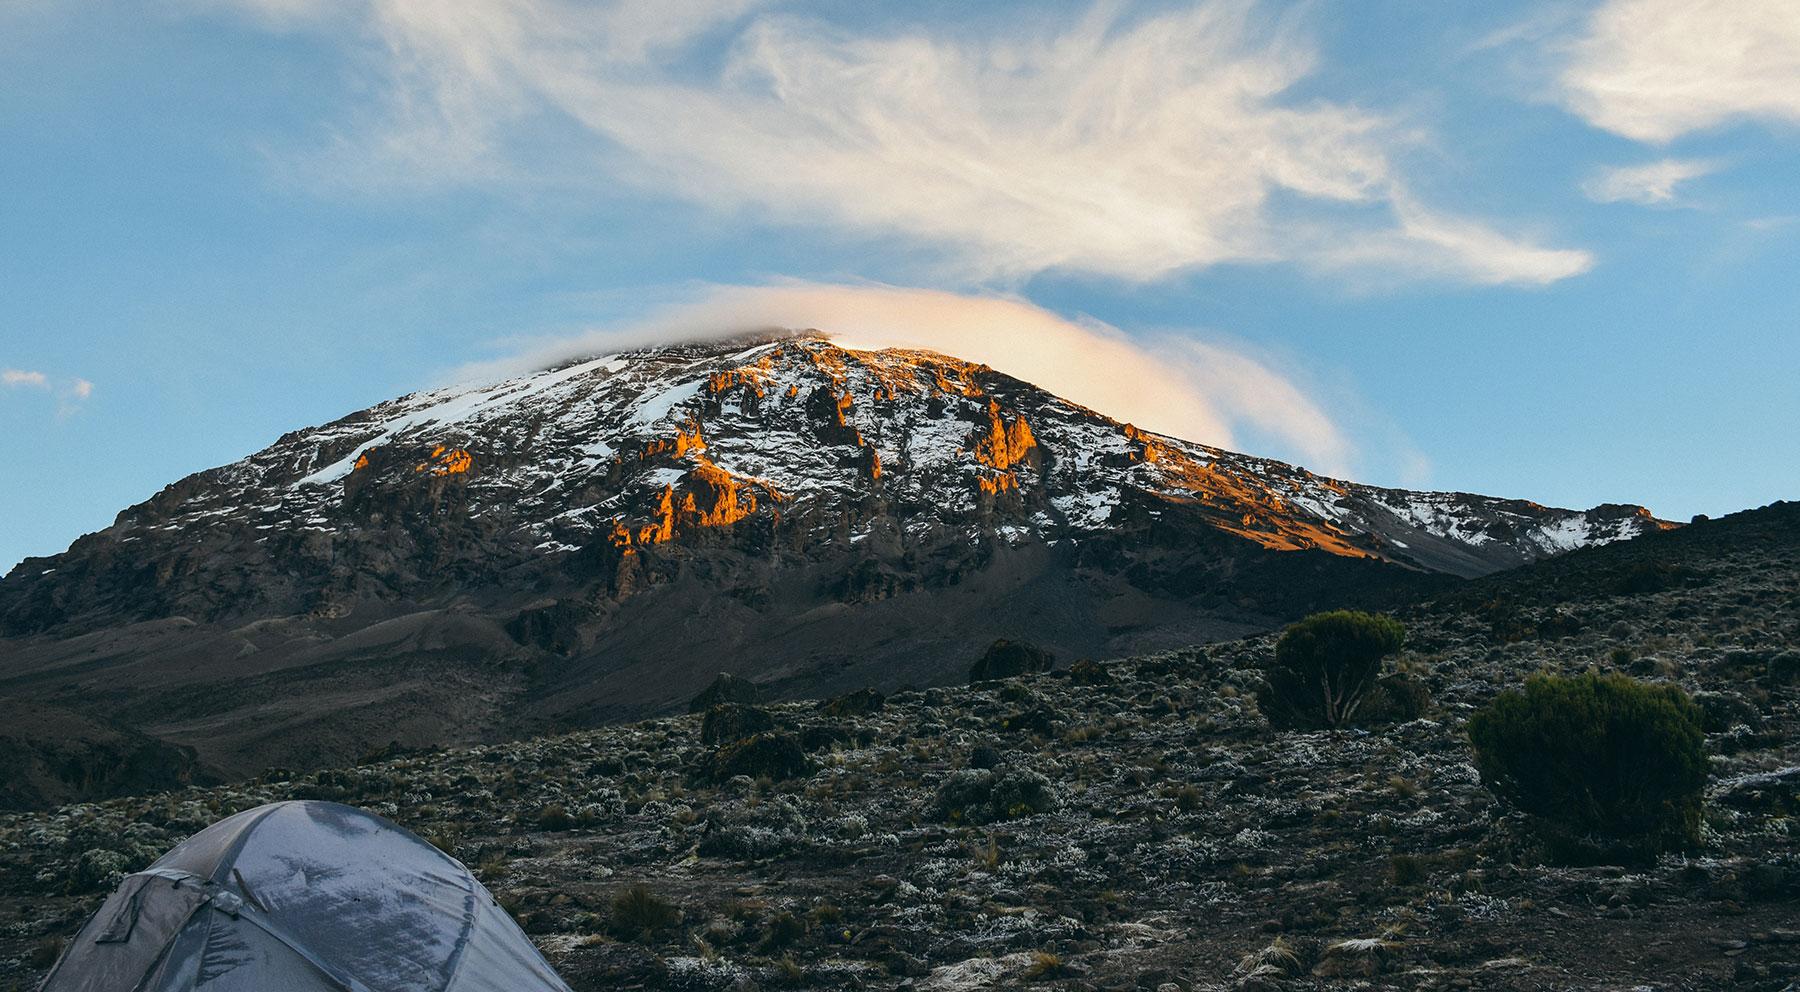 Mount Kilimanjaro views